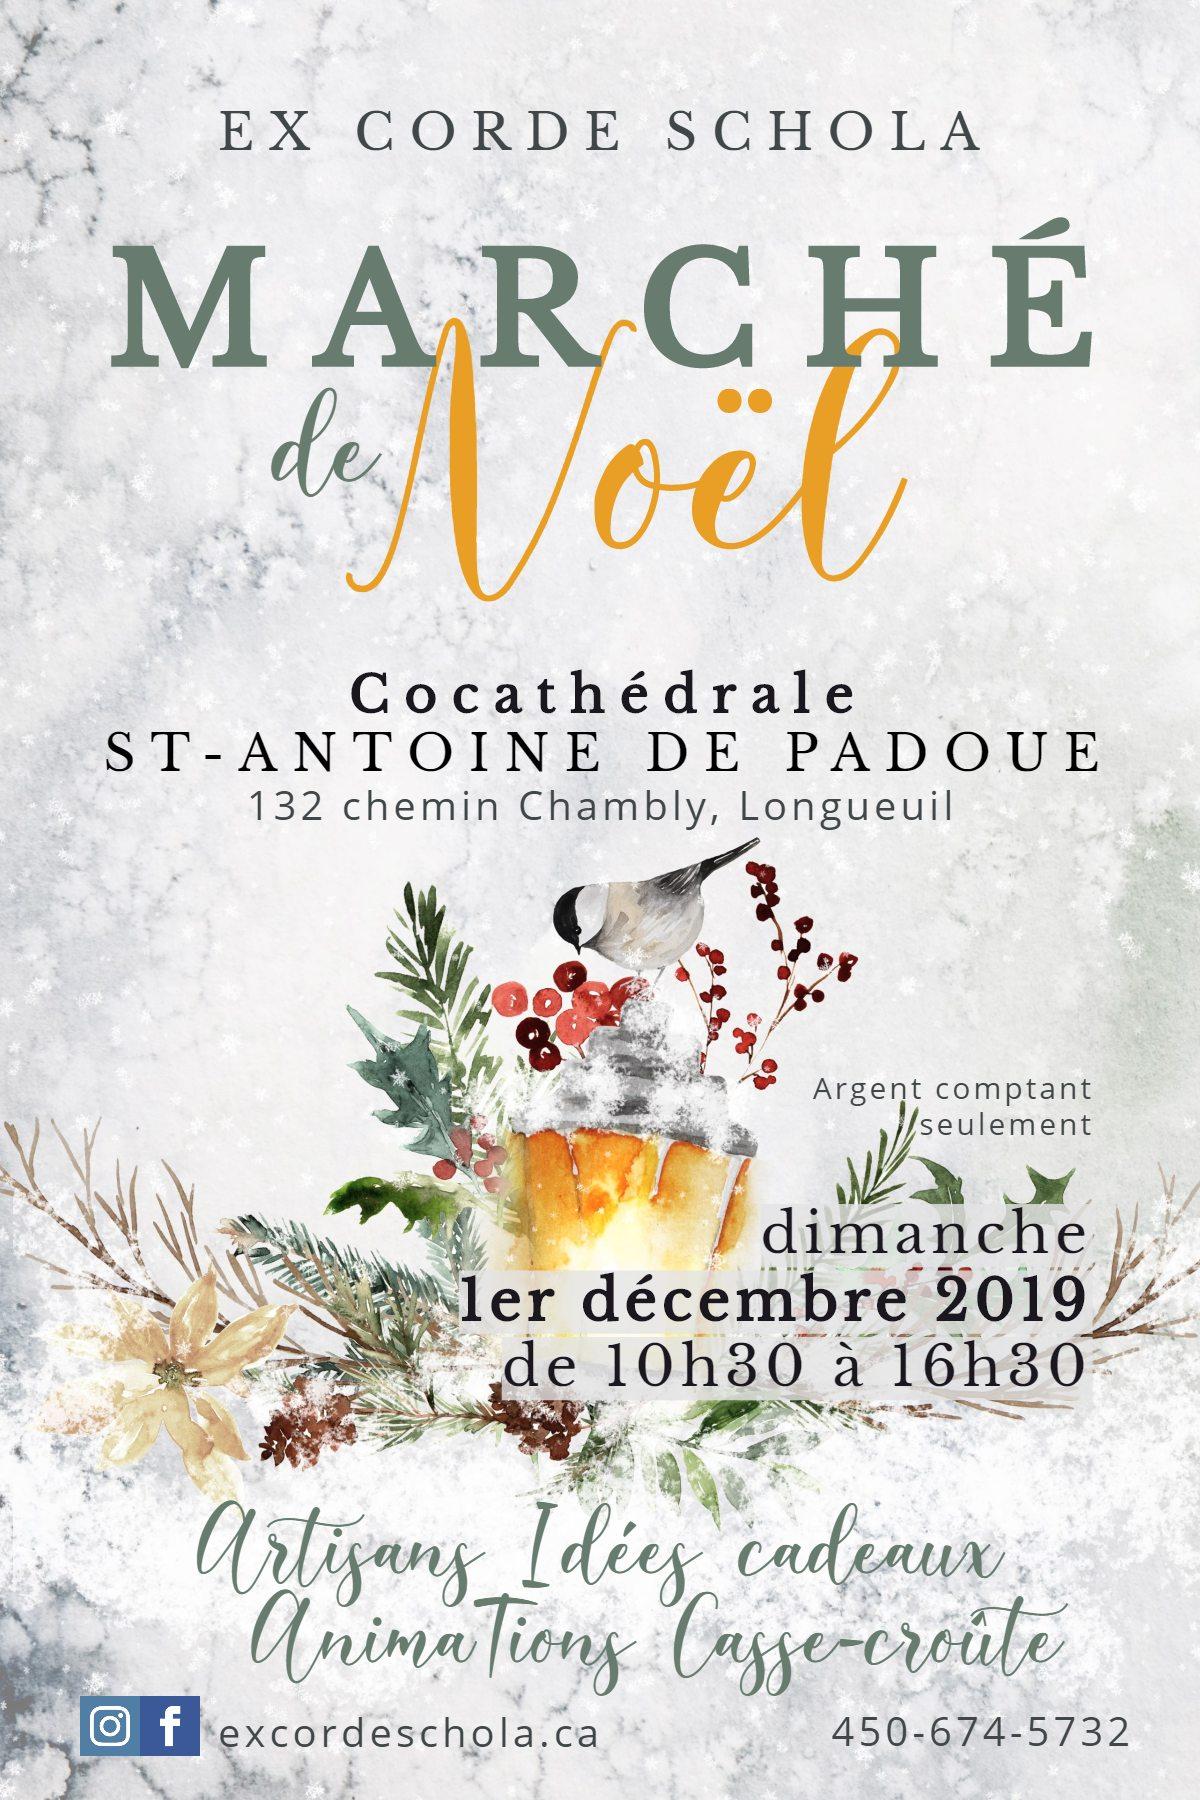 2019 Marché de Noel d'Ex Corde Schola